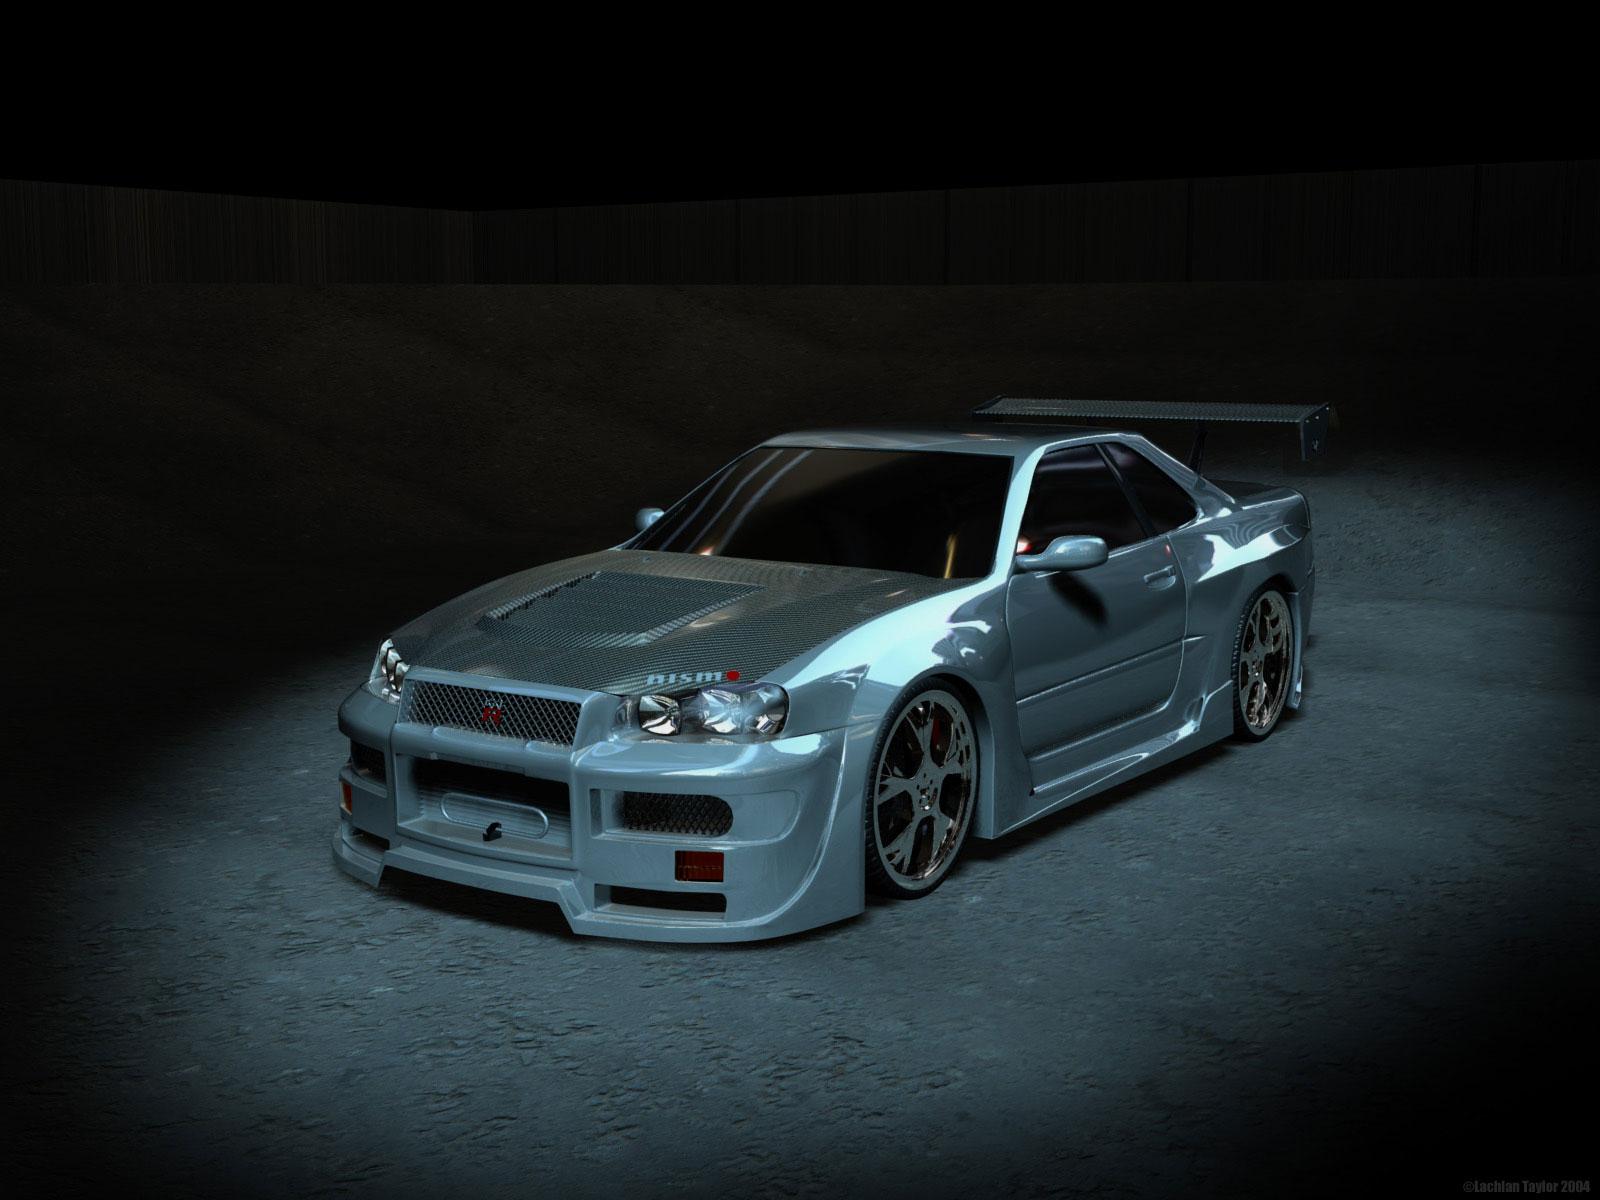 http://4.bp.blogspot.com/_KLJU3hHDGVM/THSVgFUJ85I/AAAAAAAADvU/CAB31YGimG8/s1600/Cars_images.jpg